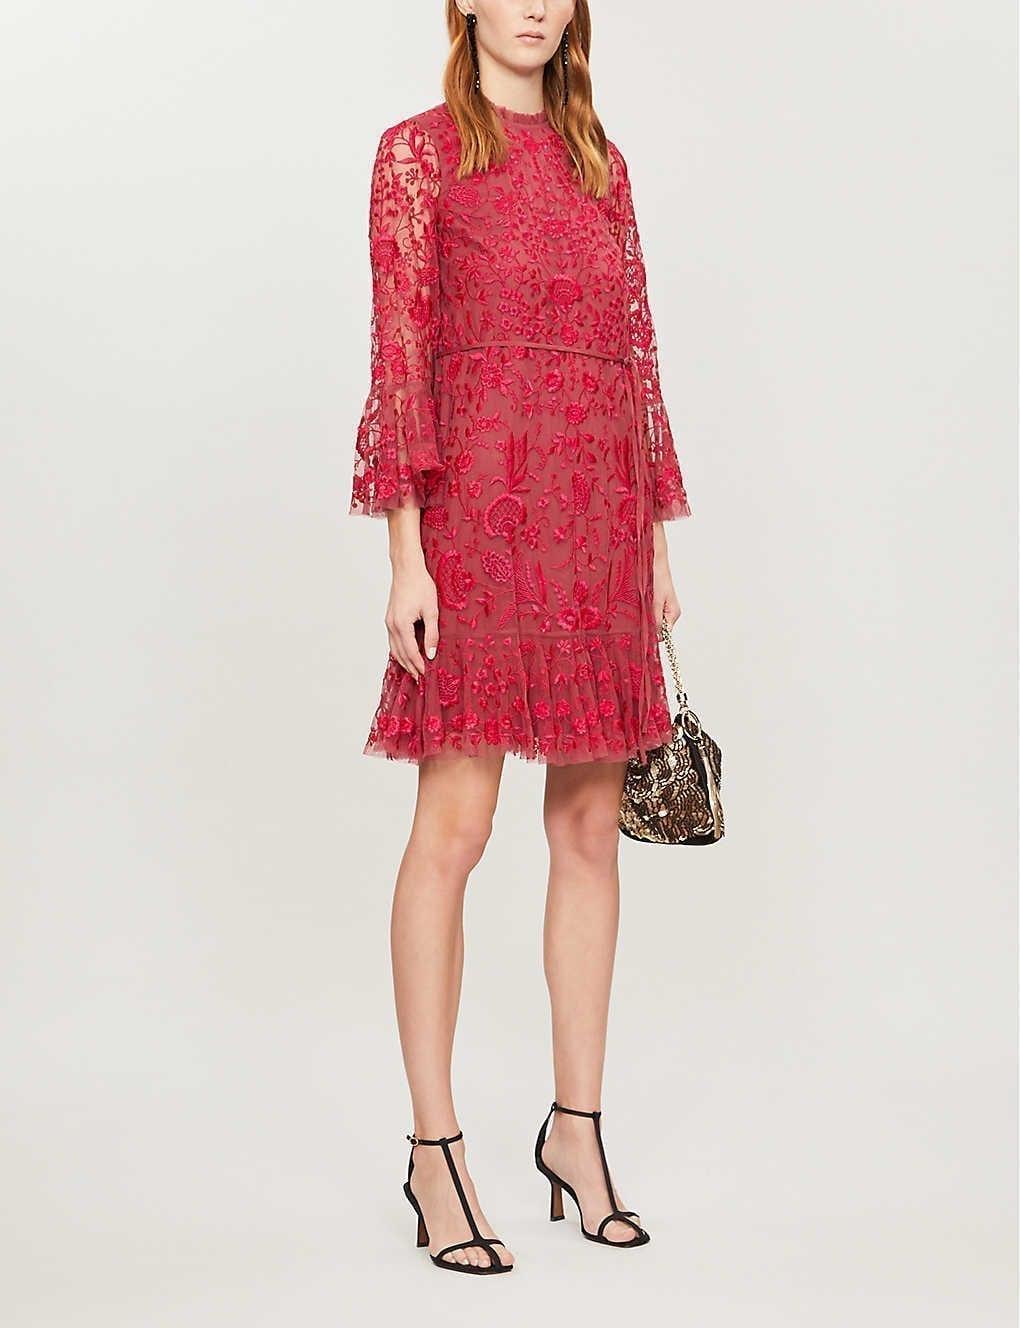 NEEDLE AND THREAD Demetria Floral-embroidered Mesh Mini Dress